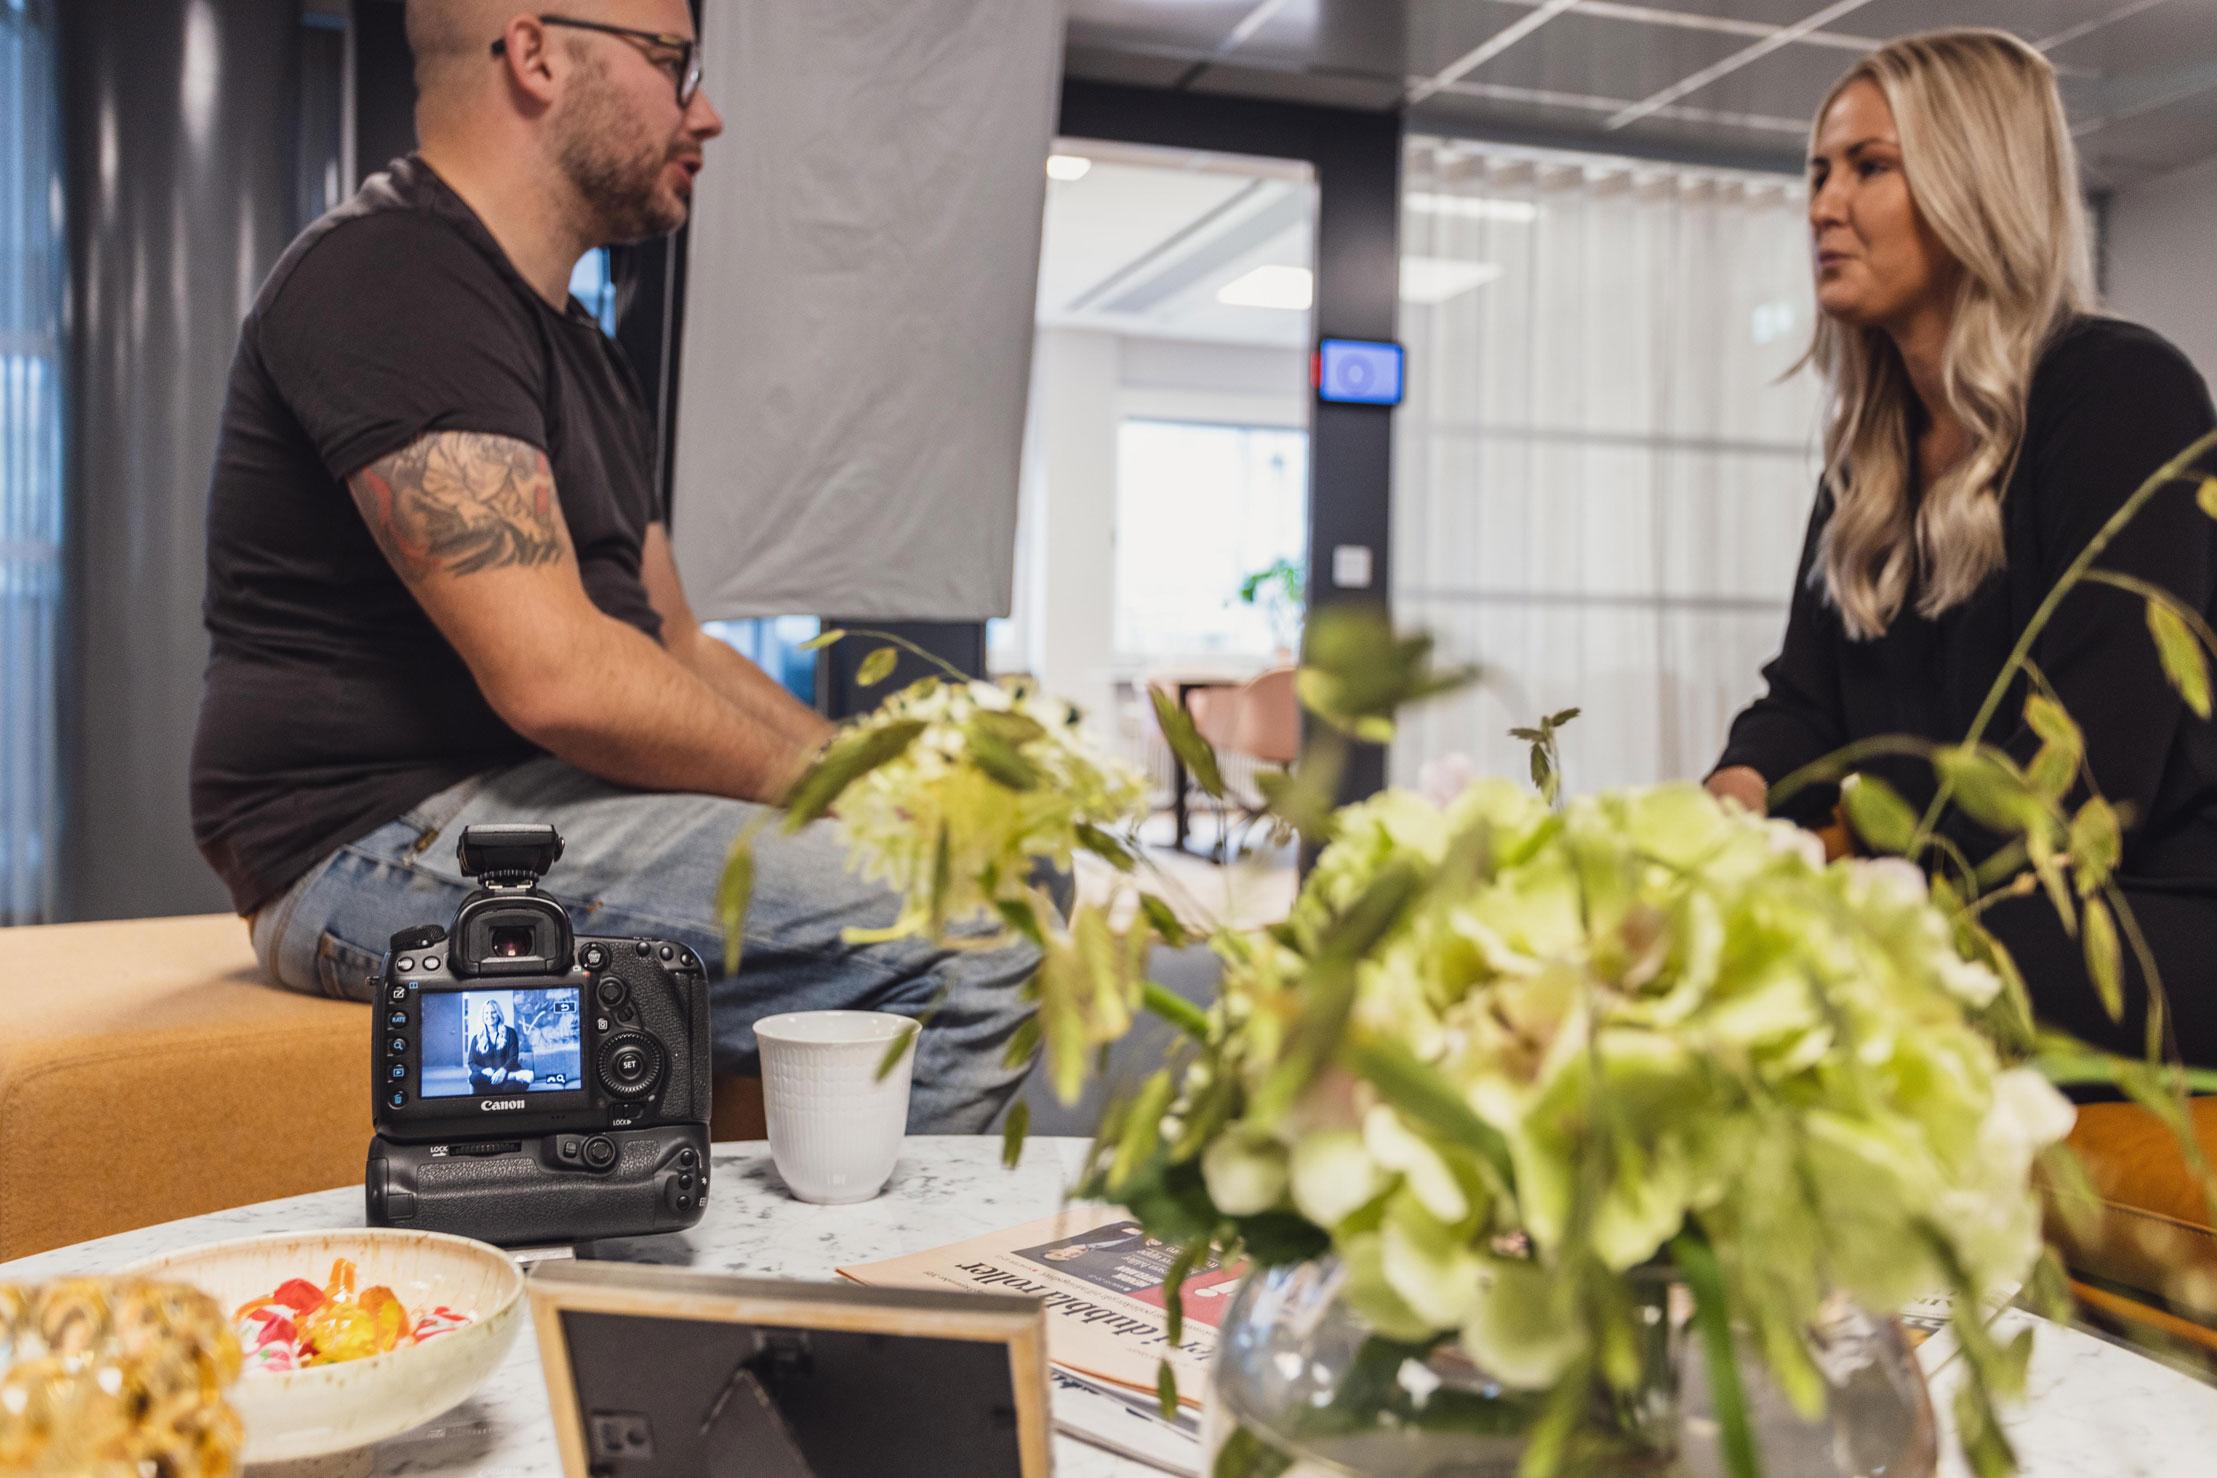 En dag i studion med Carl-Henrik, Elite Studio grundaren Elite Studio reklamfoto reklamfilm filmproduktion Reklam, content, marknadsföring, fotograf, fotografi, foto, video, Videograf